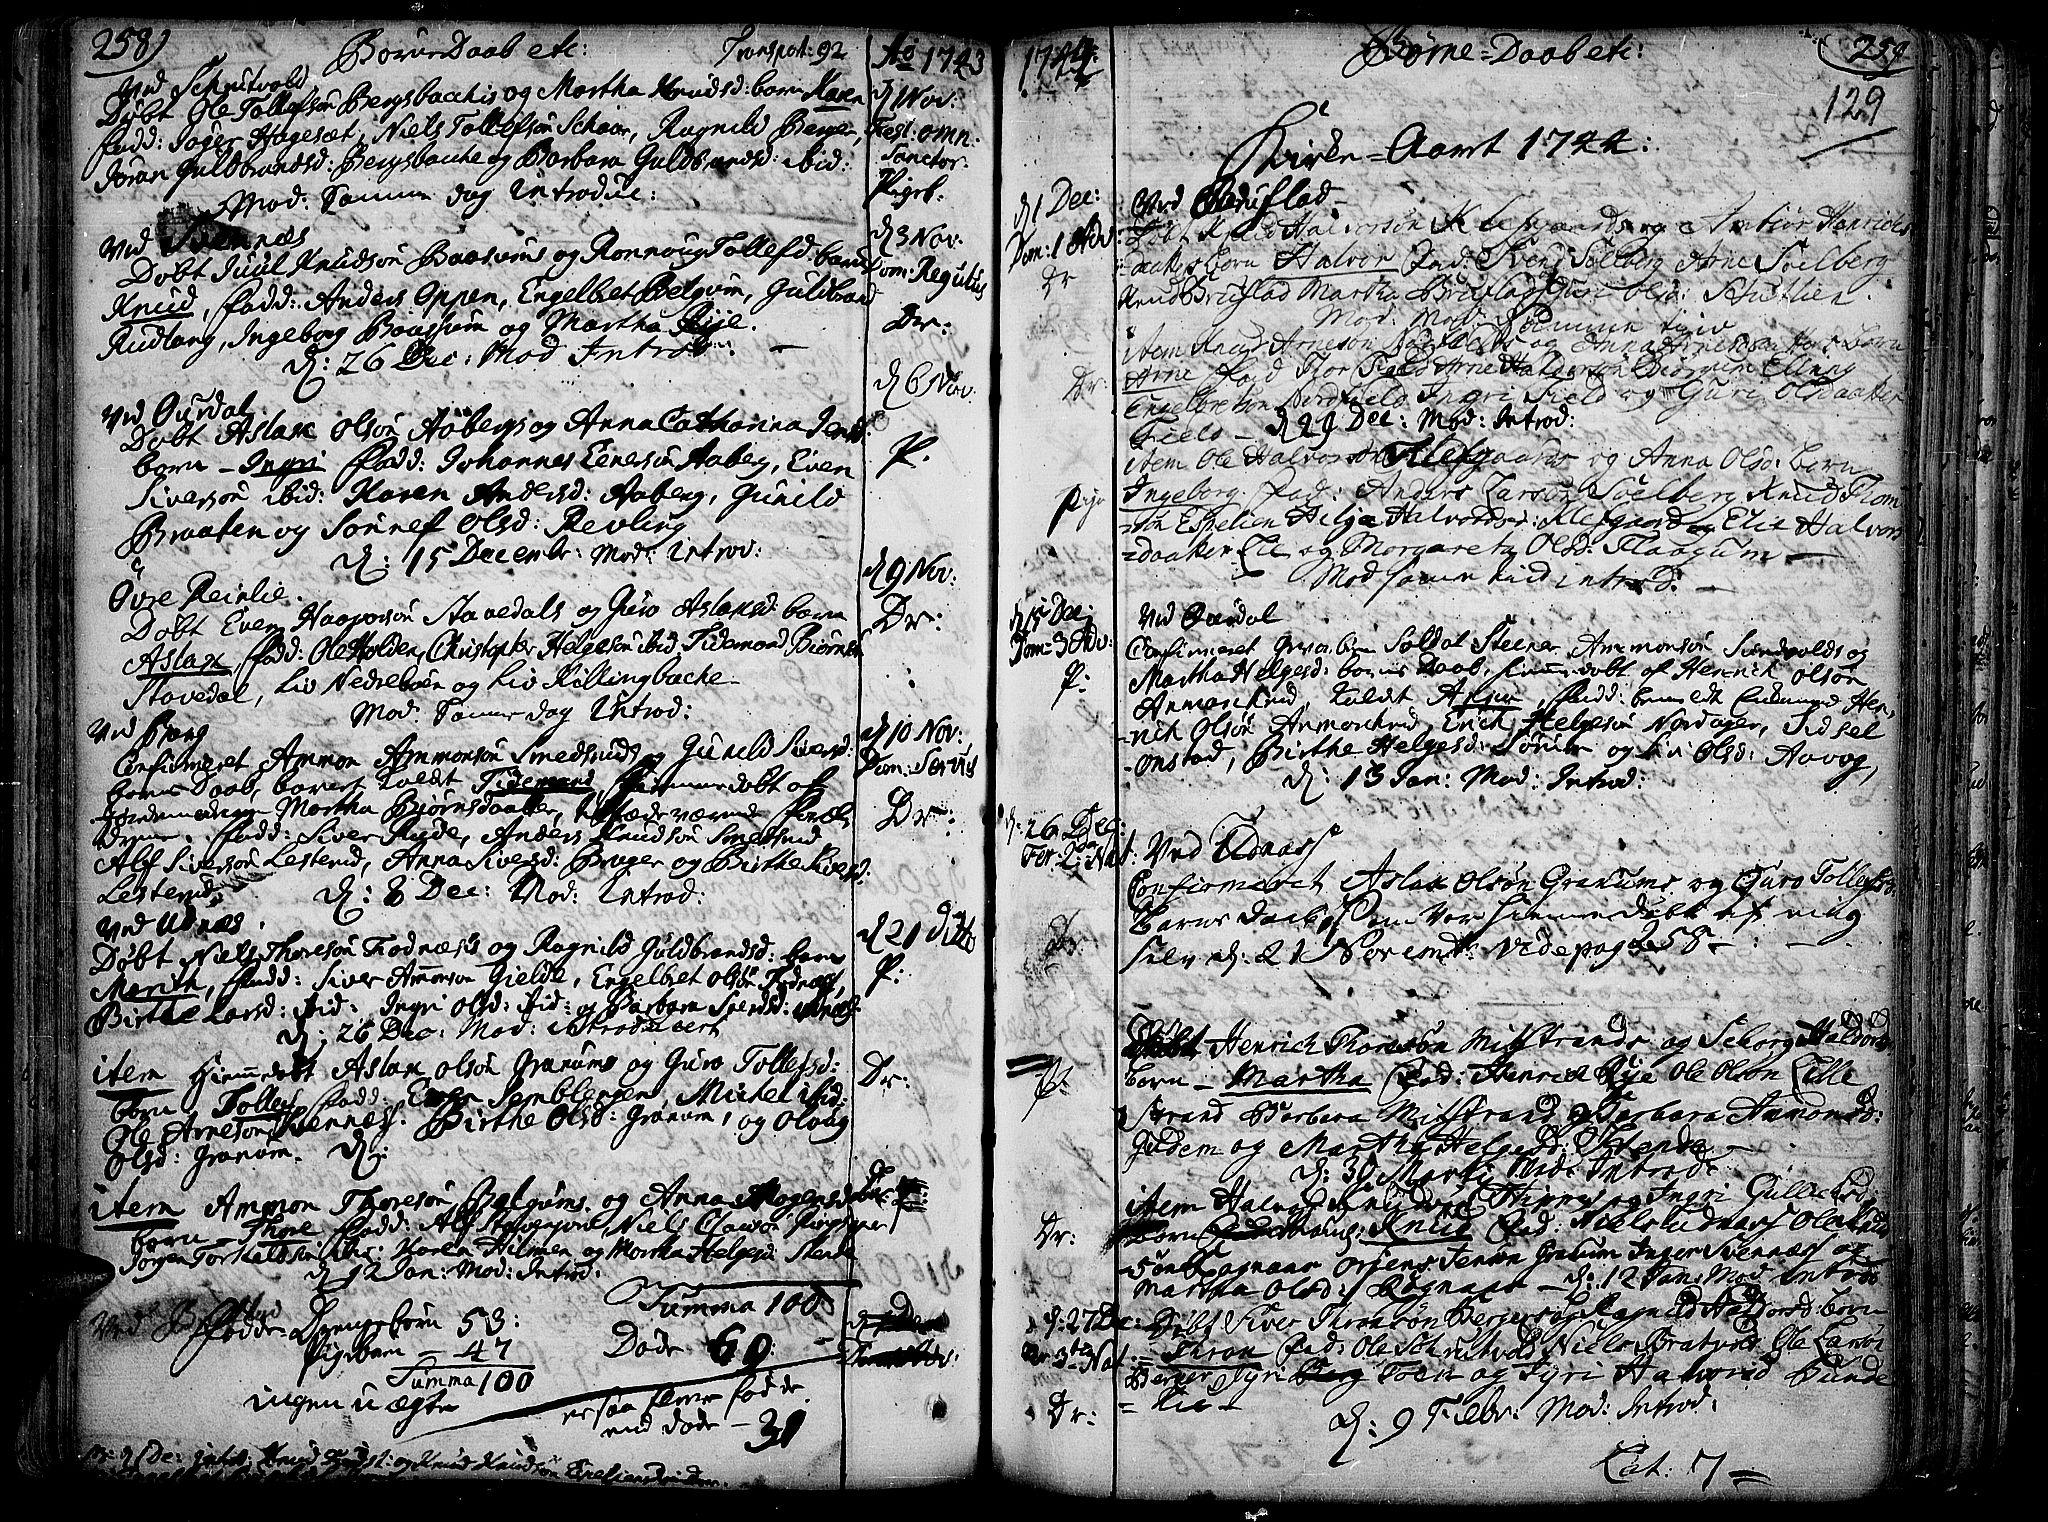 SAH, Aurdal prestekontor, Ministerialbok nr. 4, 1730-1762, s. 258-259